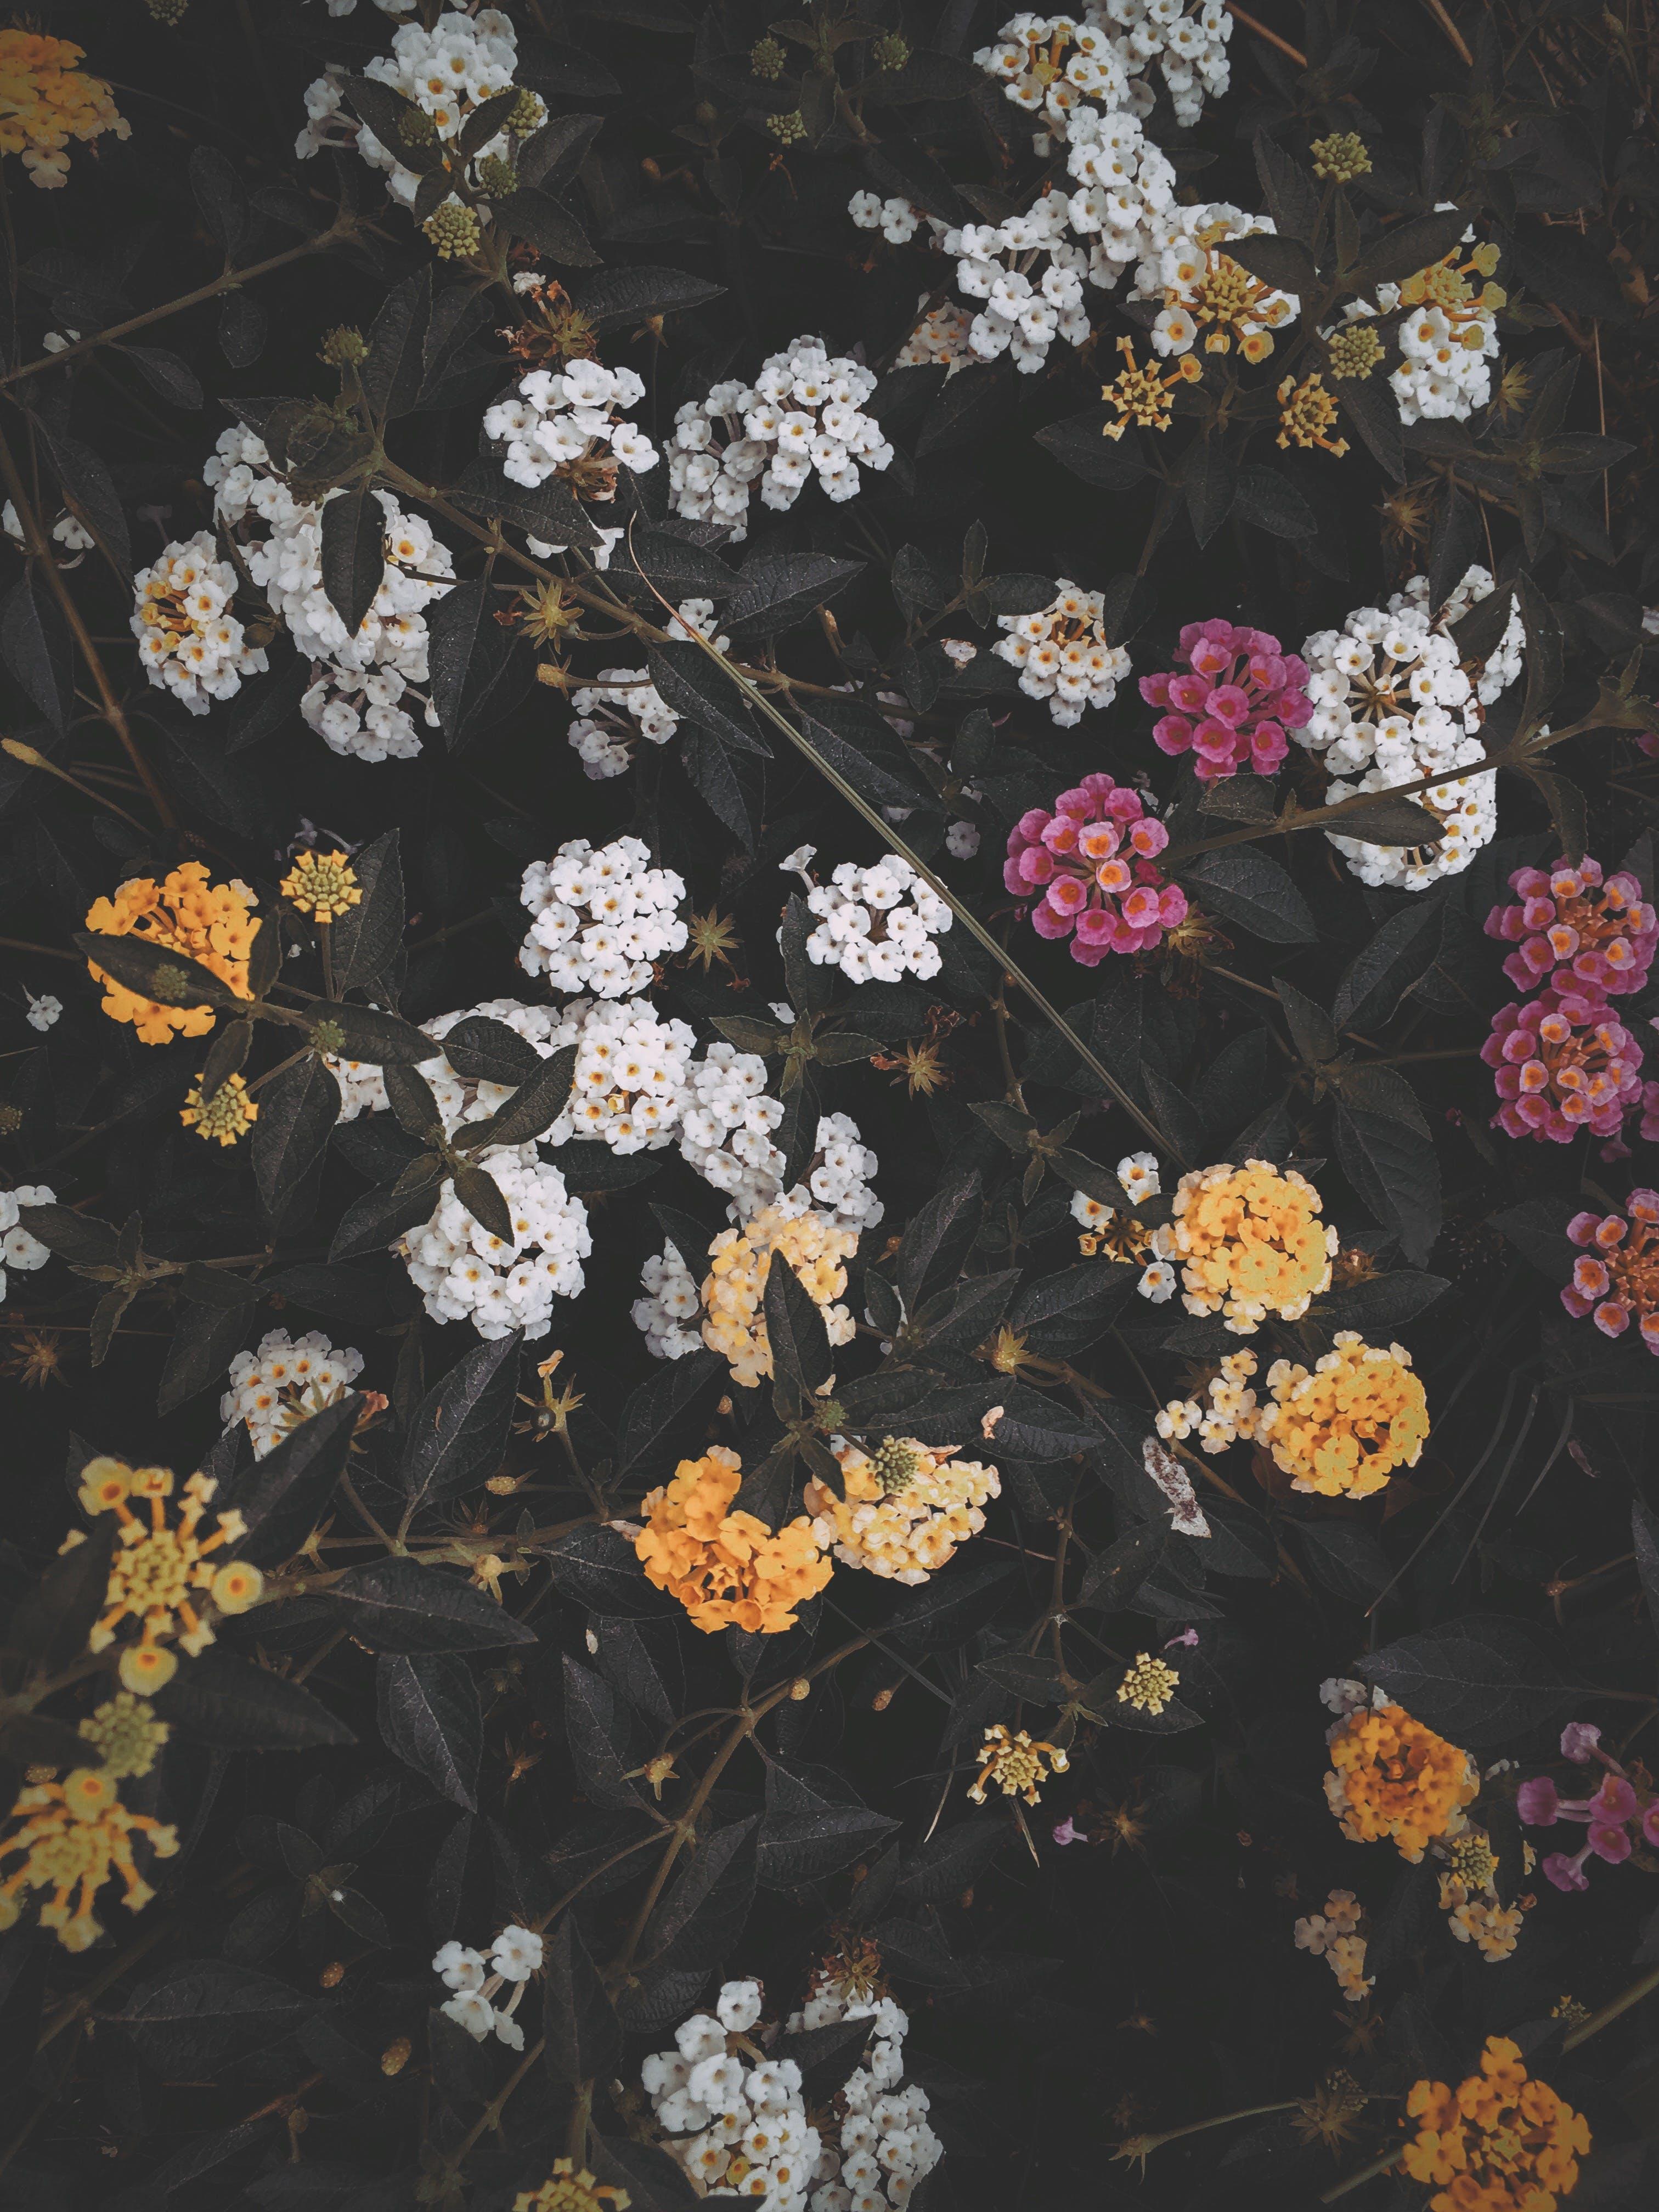 Free stock photo of beautiful flowers, blossom, flower, nature